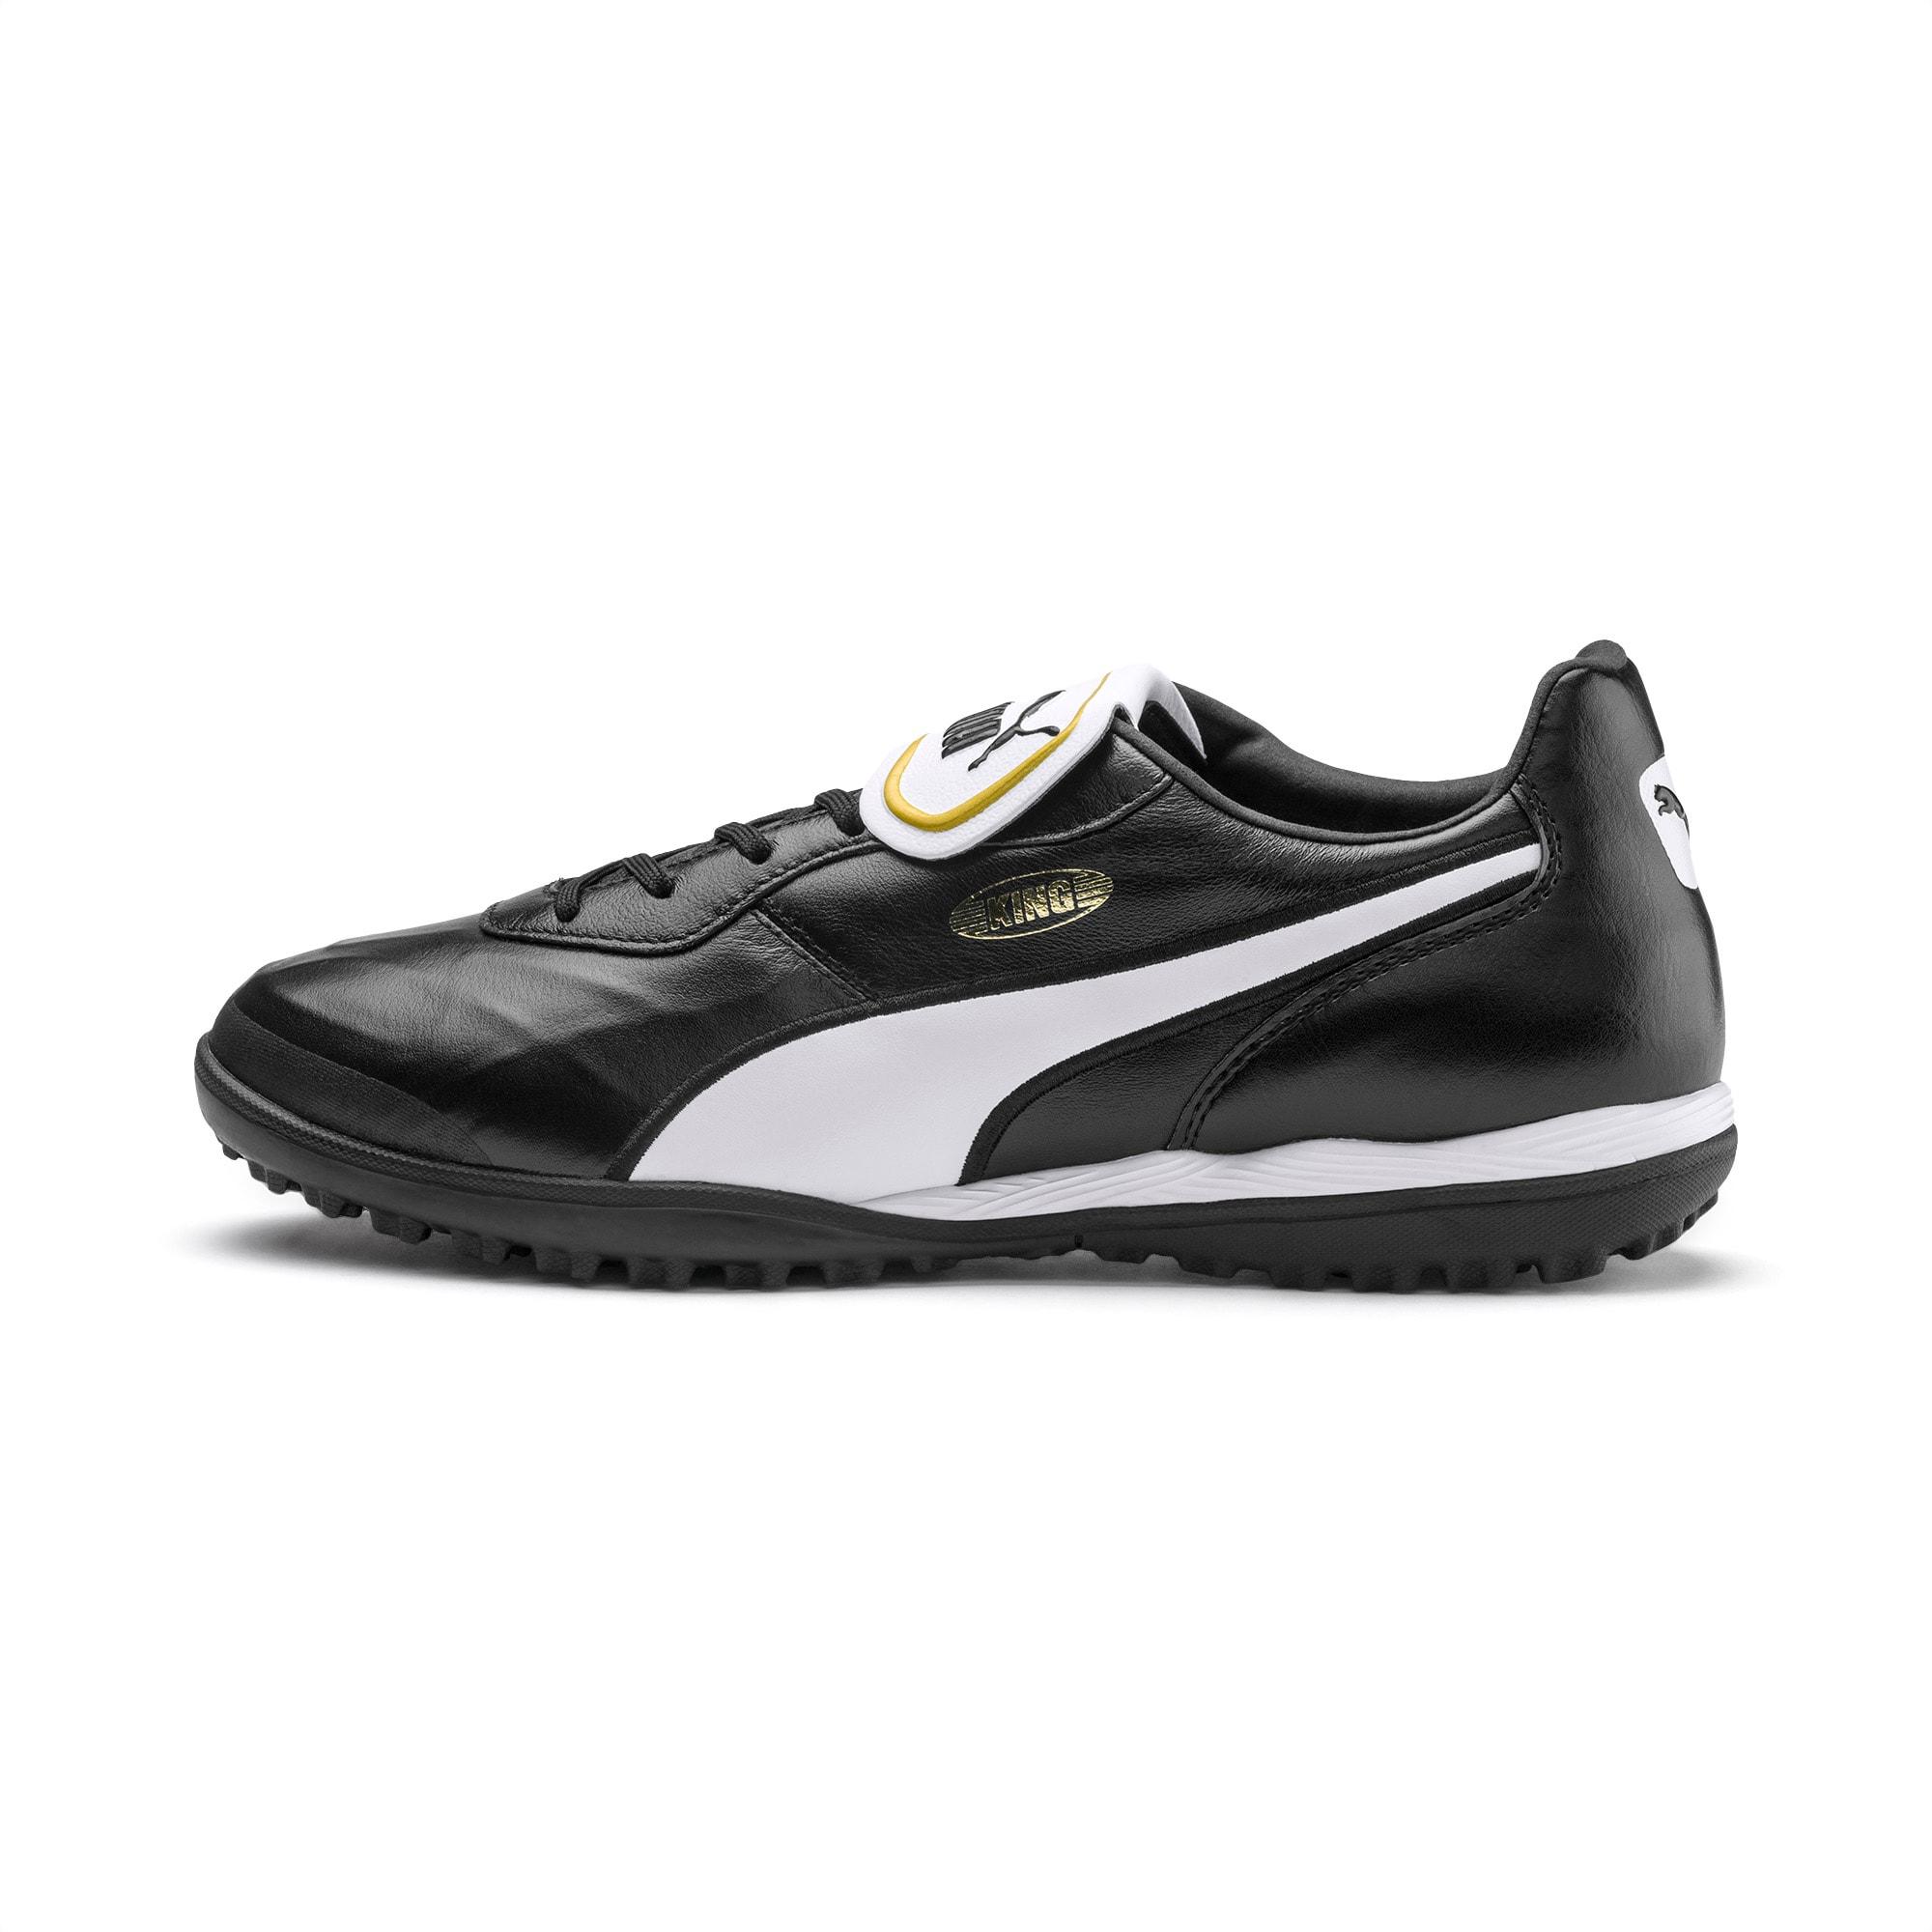 King Top TT Soccer Shoes